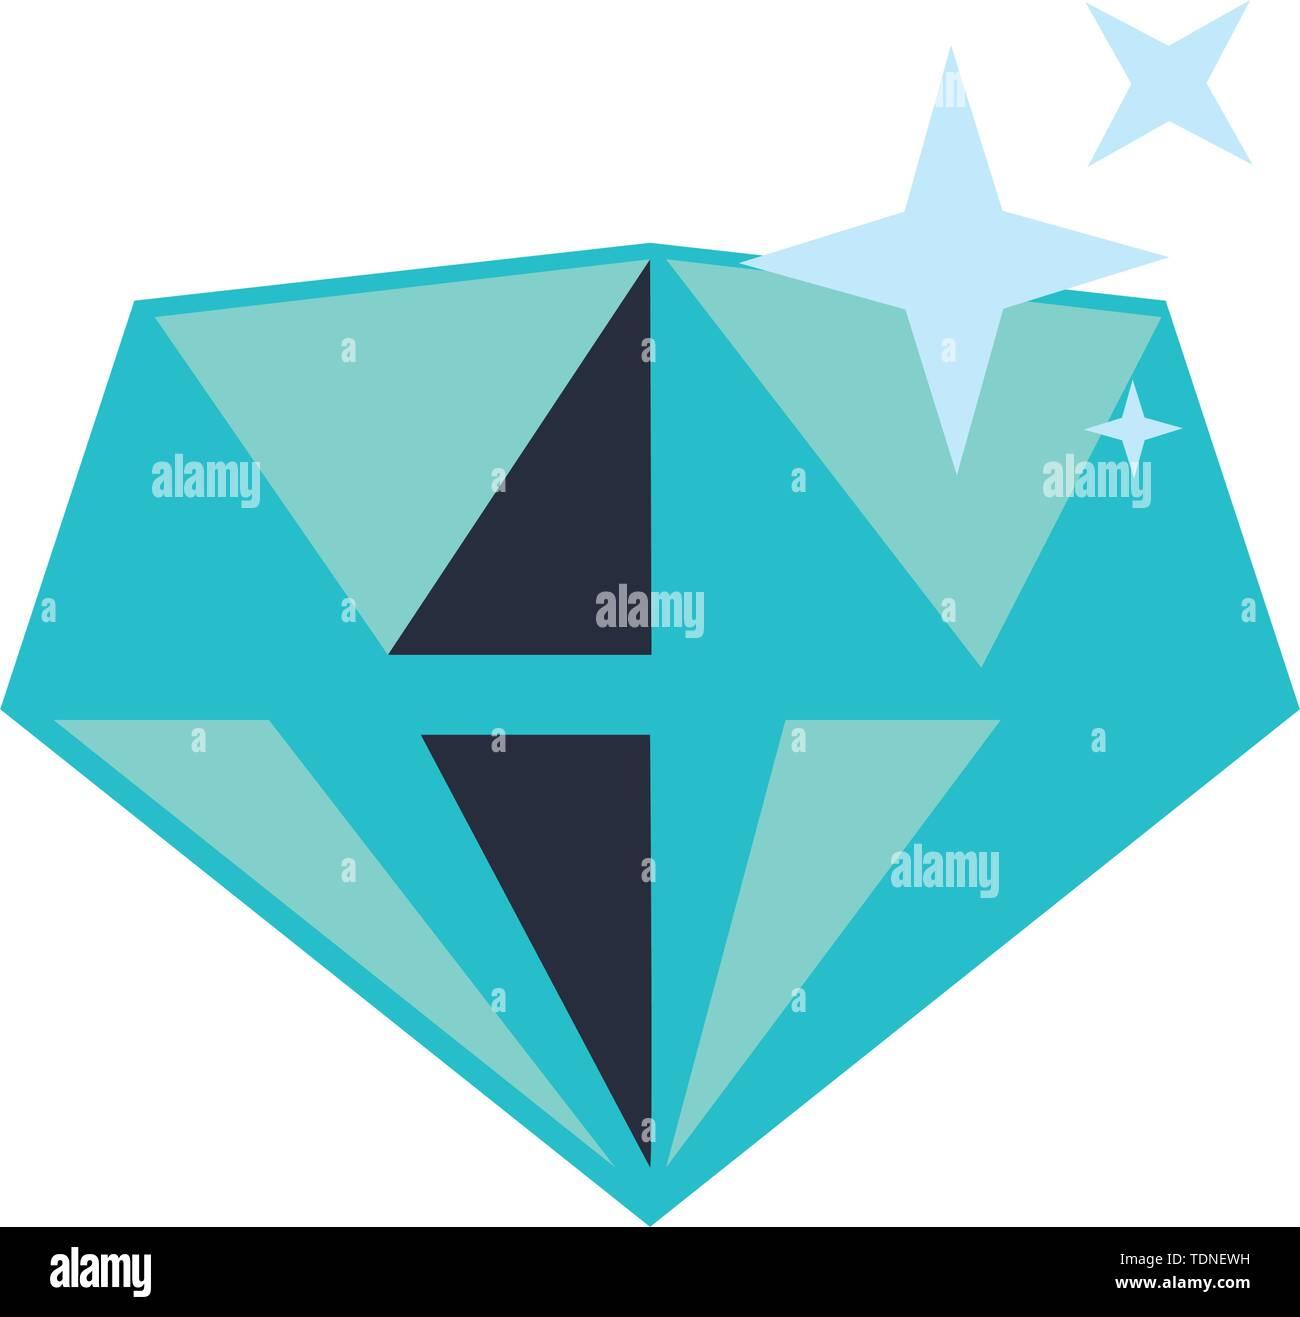 Diamond luxury rock symbol isolated vector illustration graphic design - Stock Image